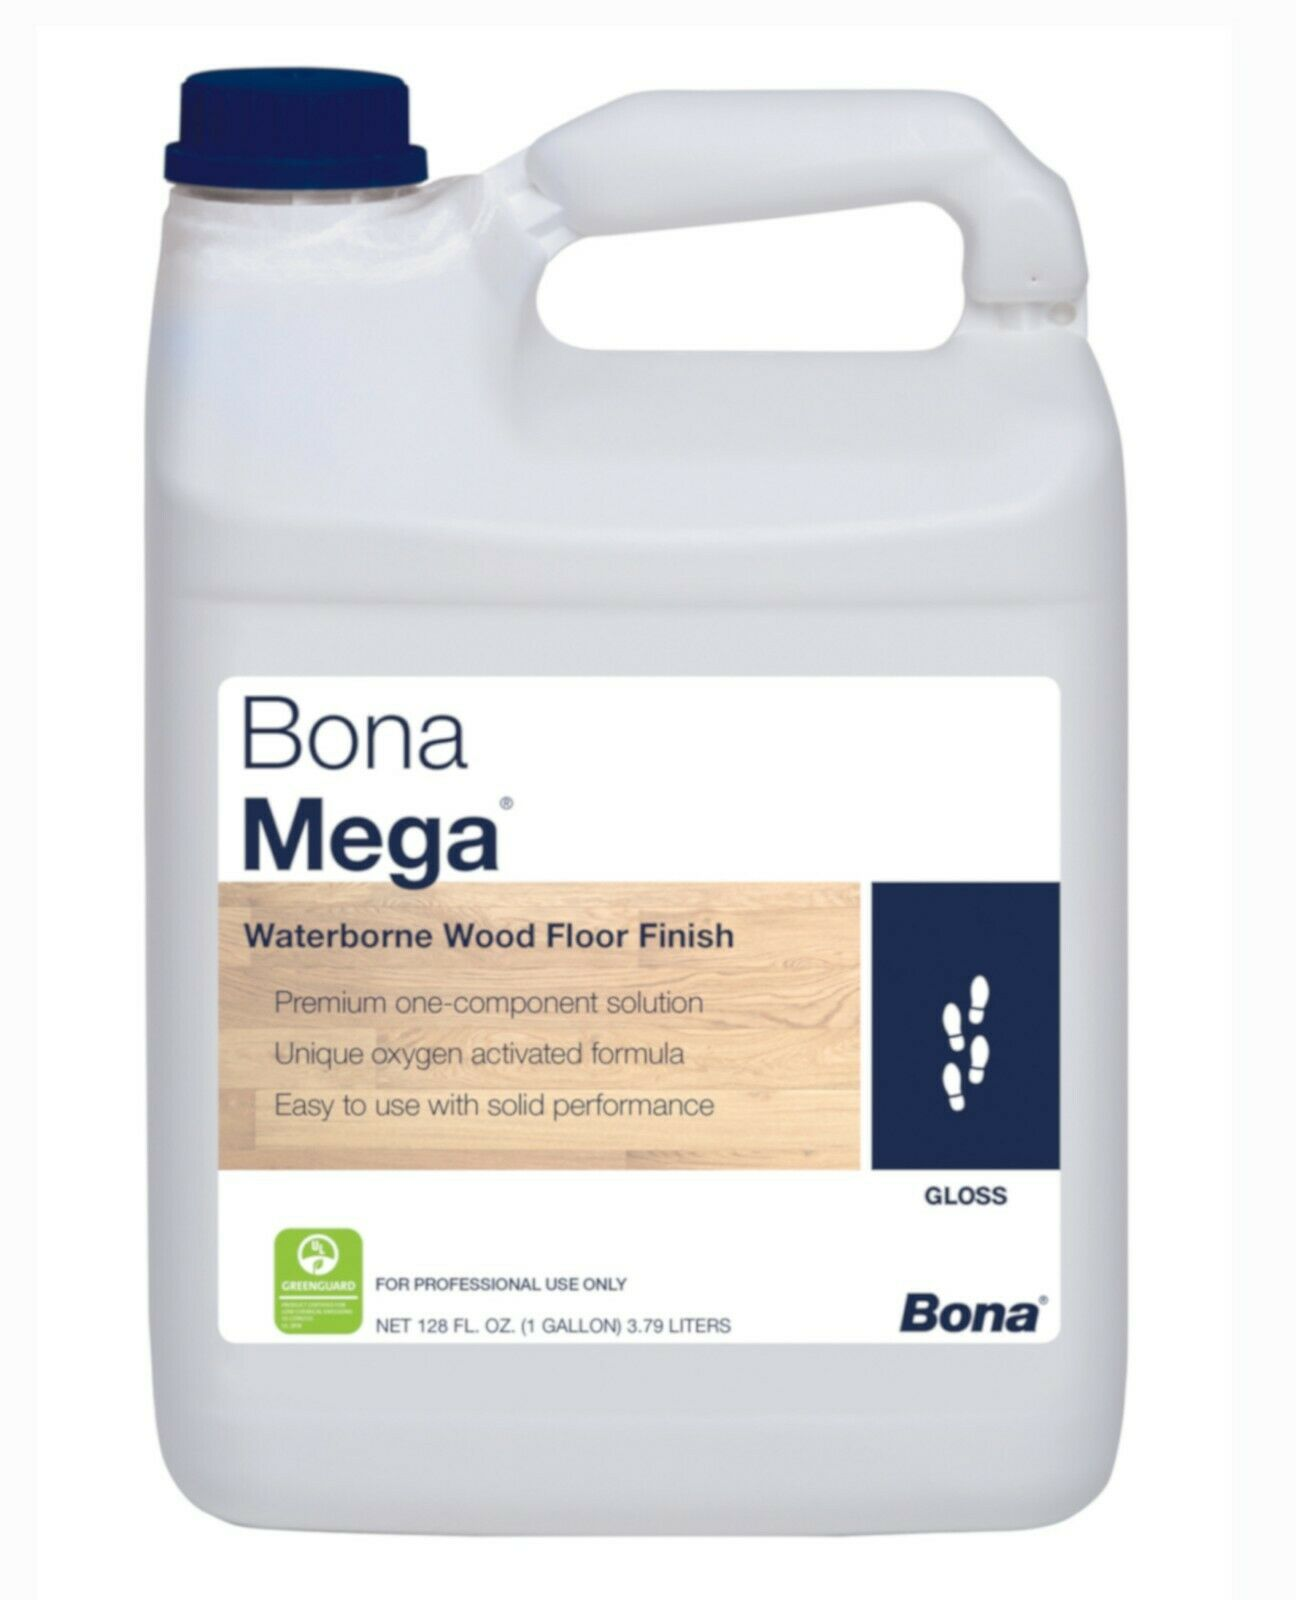 Bona Mega Wood Floor Finish Gloss - 1 Gallon